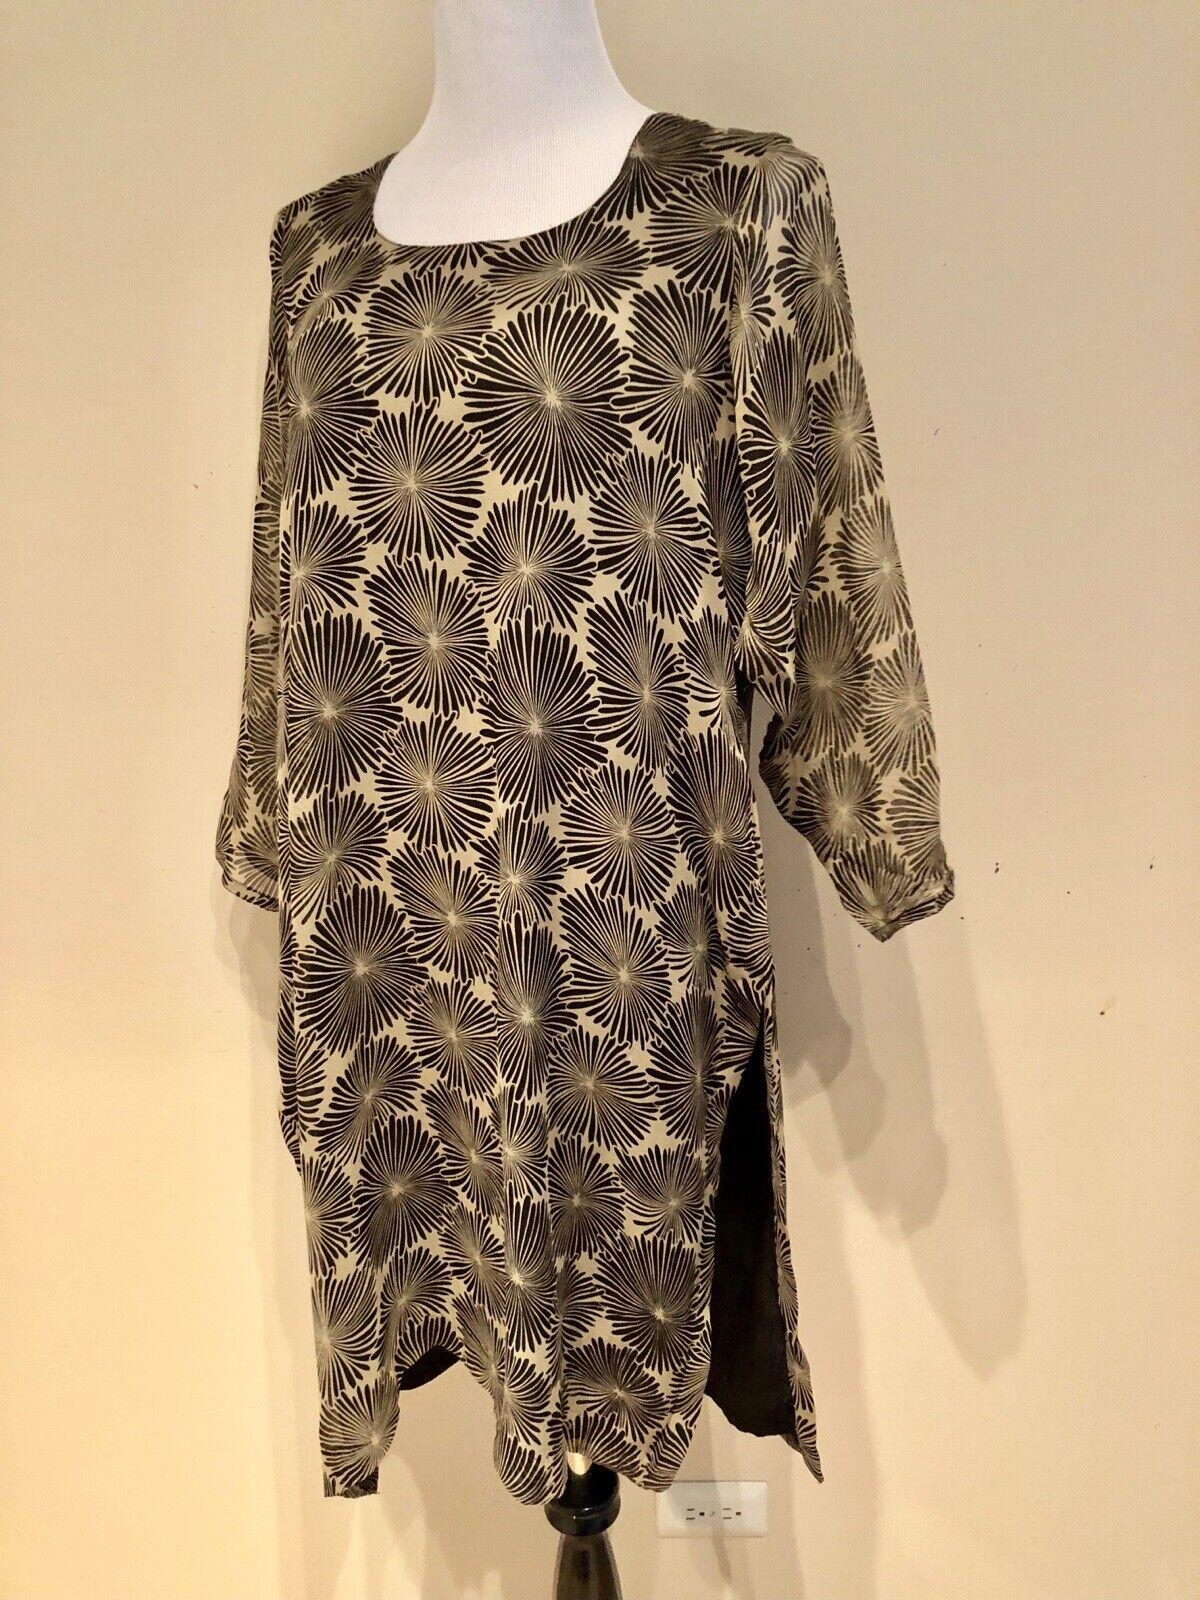 Silk Chiffon Salwar Kameez Dress - image 4